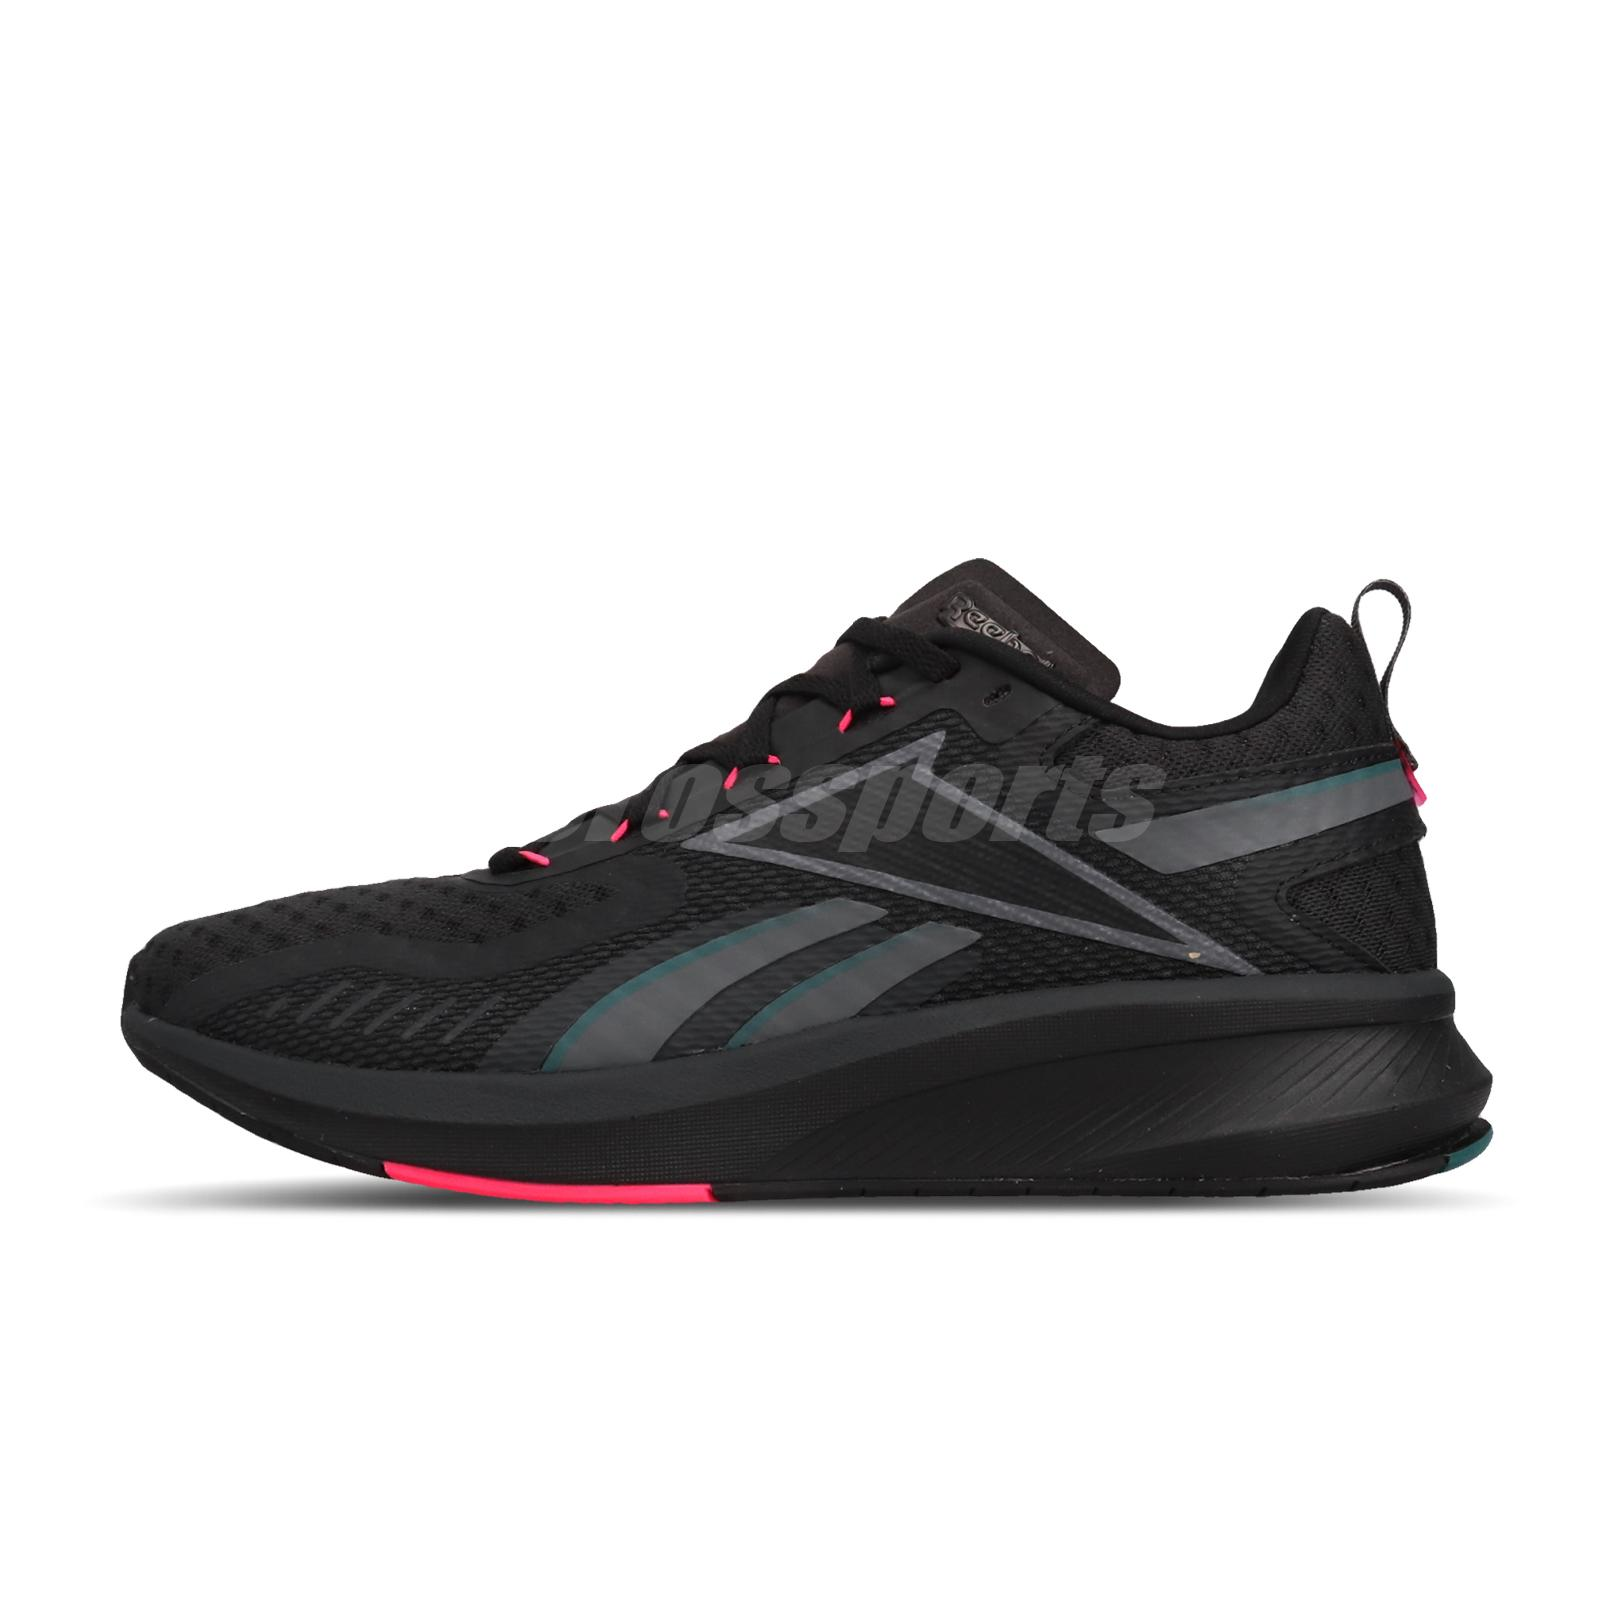 Reebok Rbk Fusium Run 20 Black Alloy Teal Gem Men Running Shoes Sneakers Eg9923 Ebay